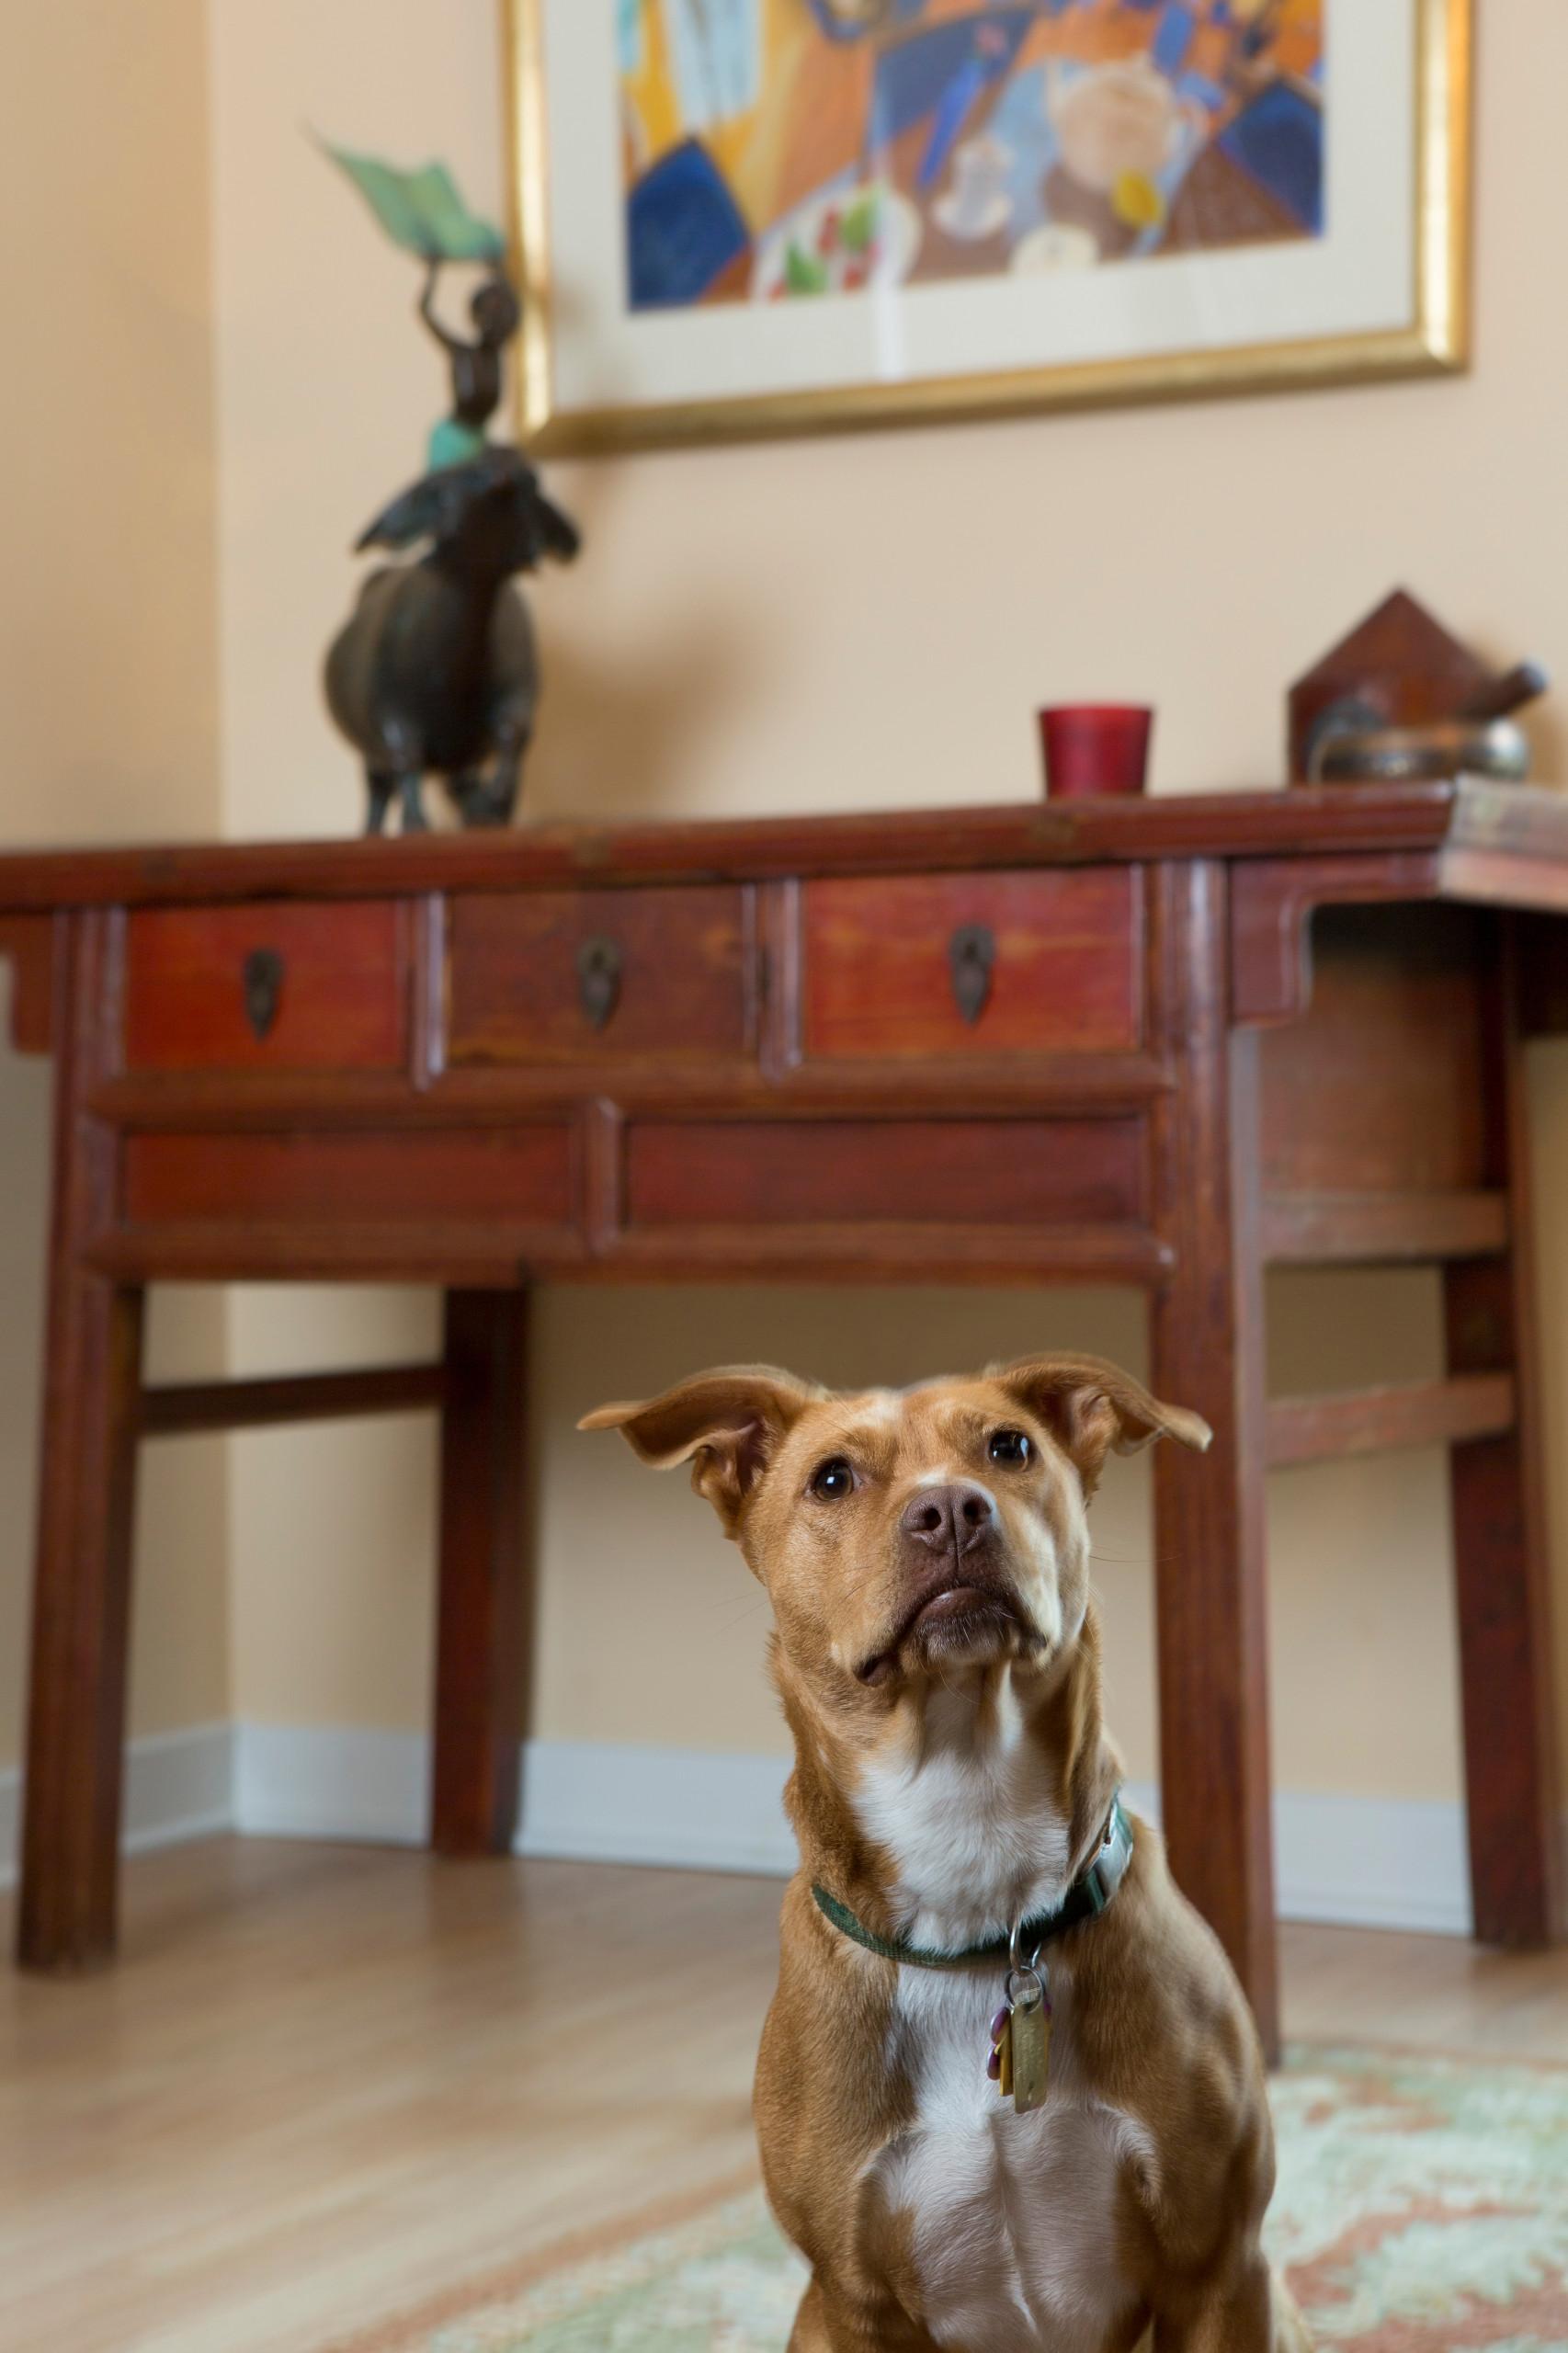 Antique Side Board & Pup